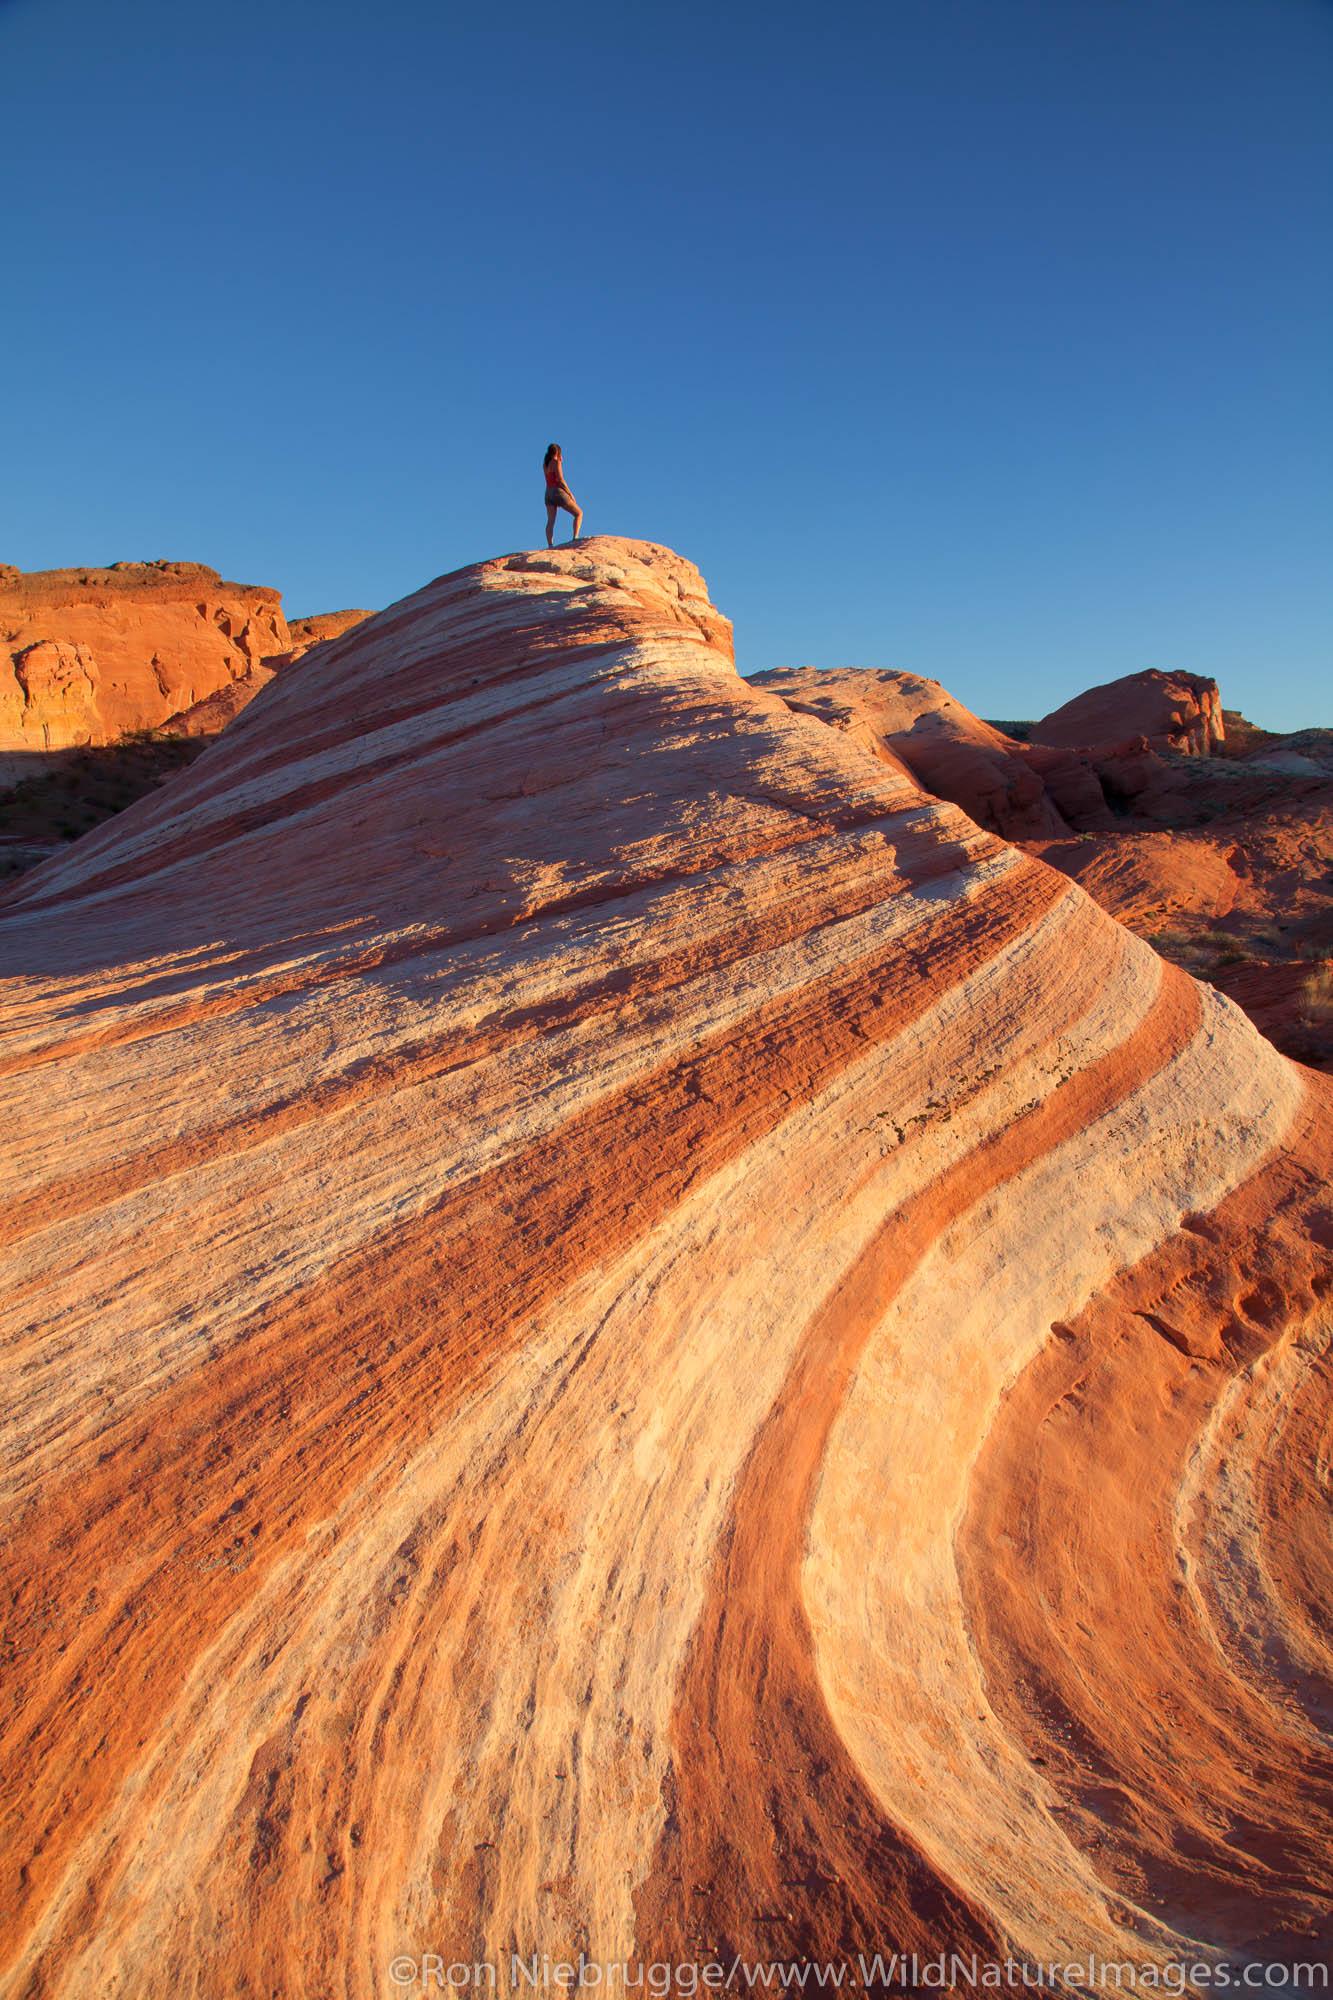 Hiker in Valley of Fire State Park, Mojave Desert, Nevada (model released)